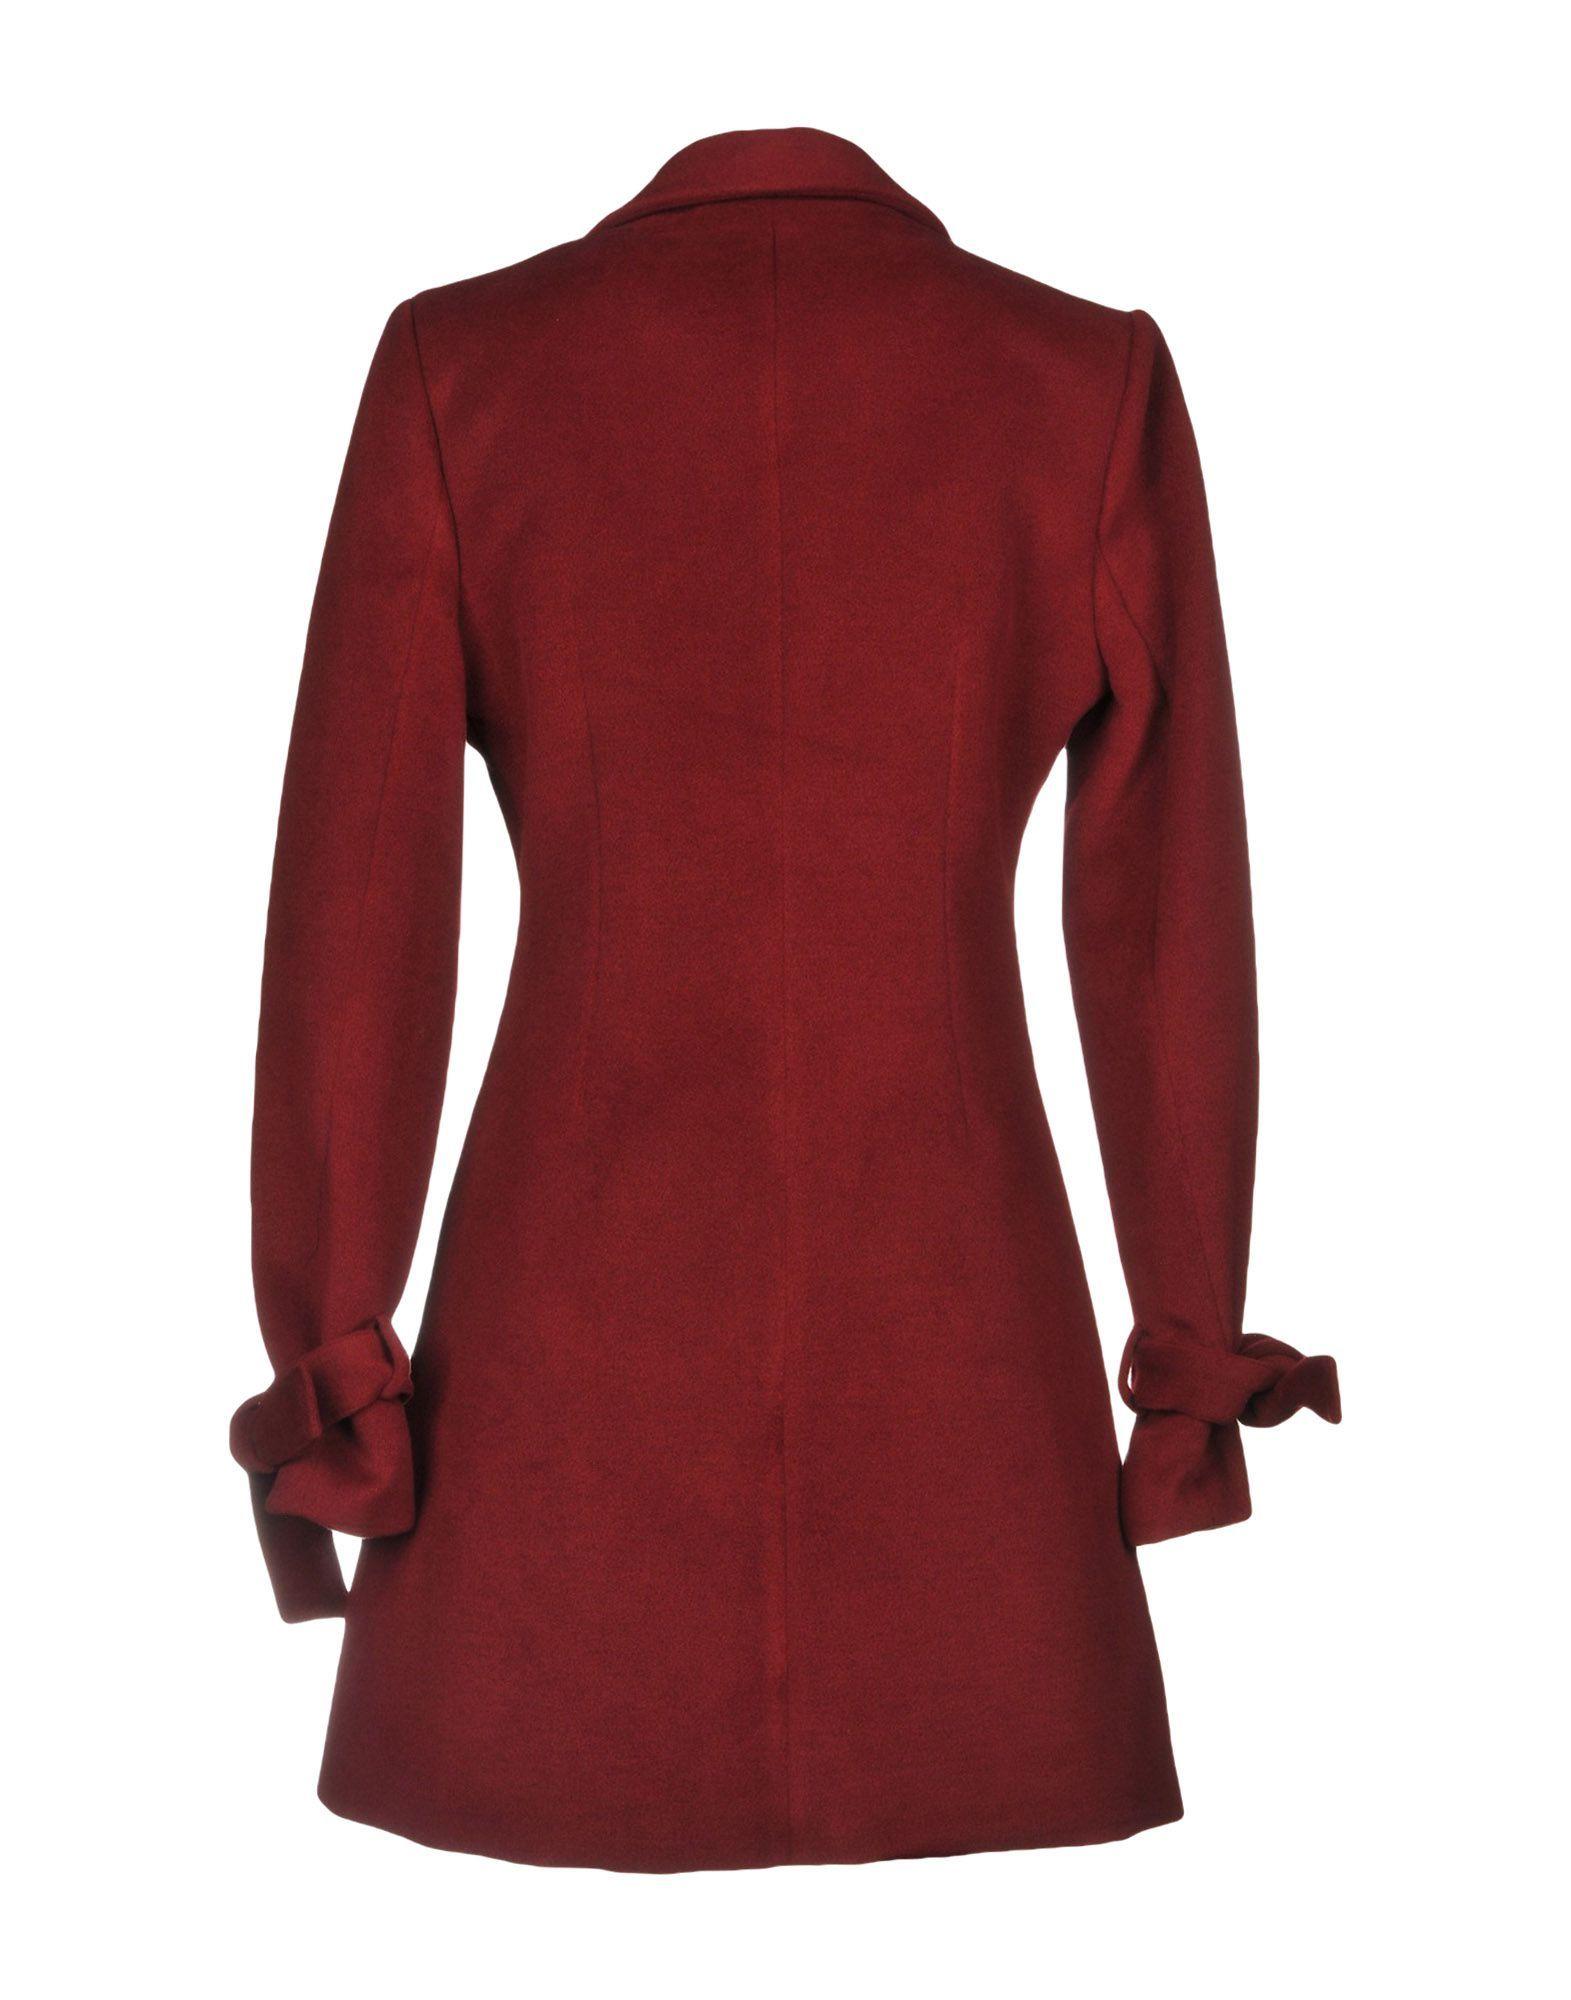 COATS & JACKETS Koralline Maroon Woman Polyester